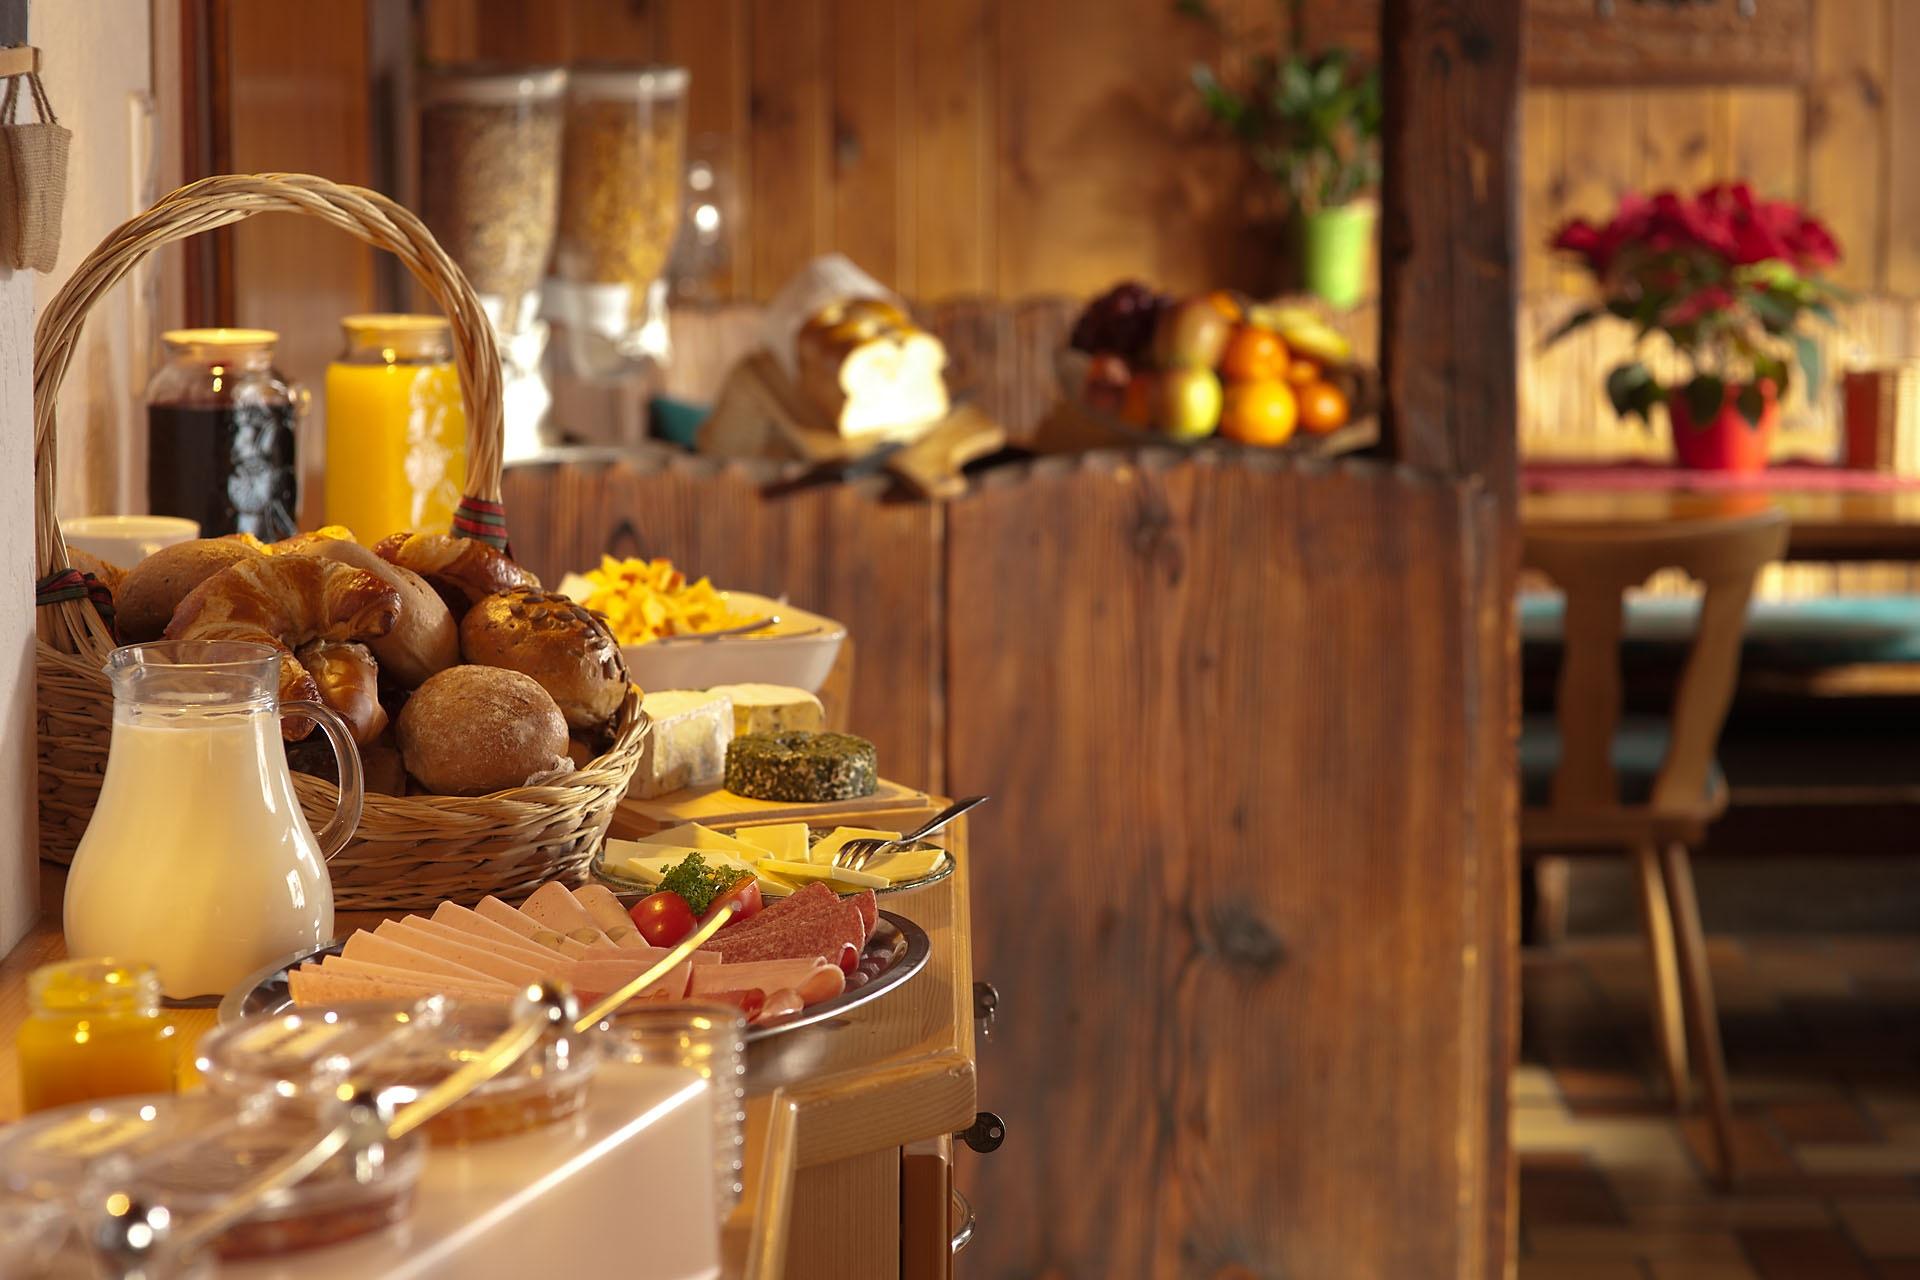 Frühstücksbuffet - nicht nur lecker, sondern gut fotografiert (Foto Claudia Viloria/Unsplash)